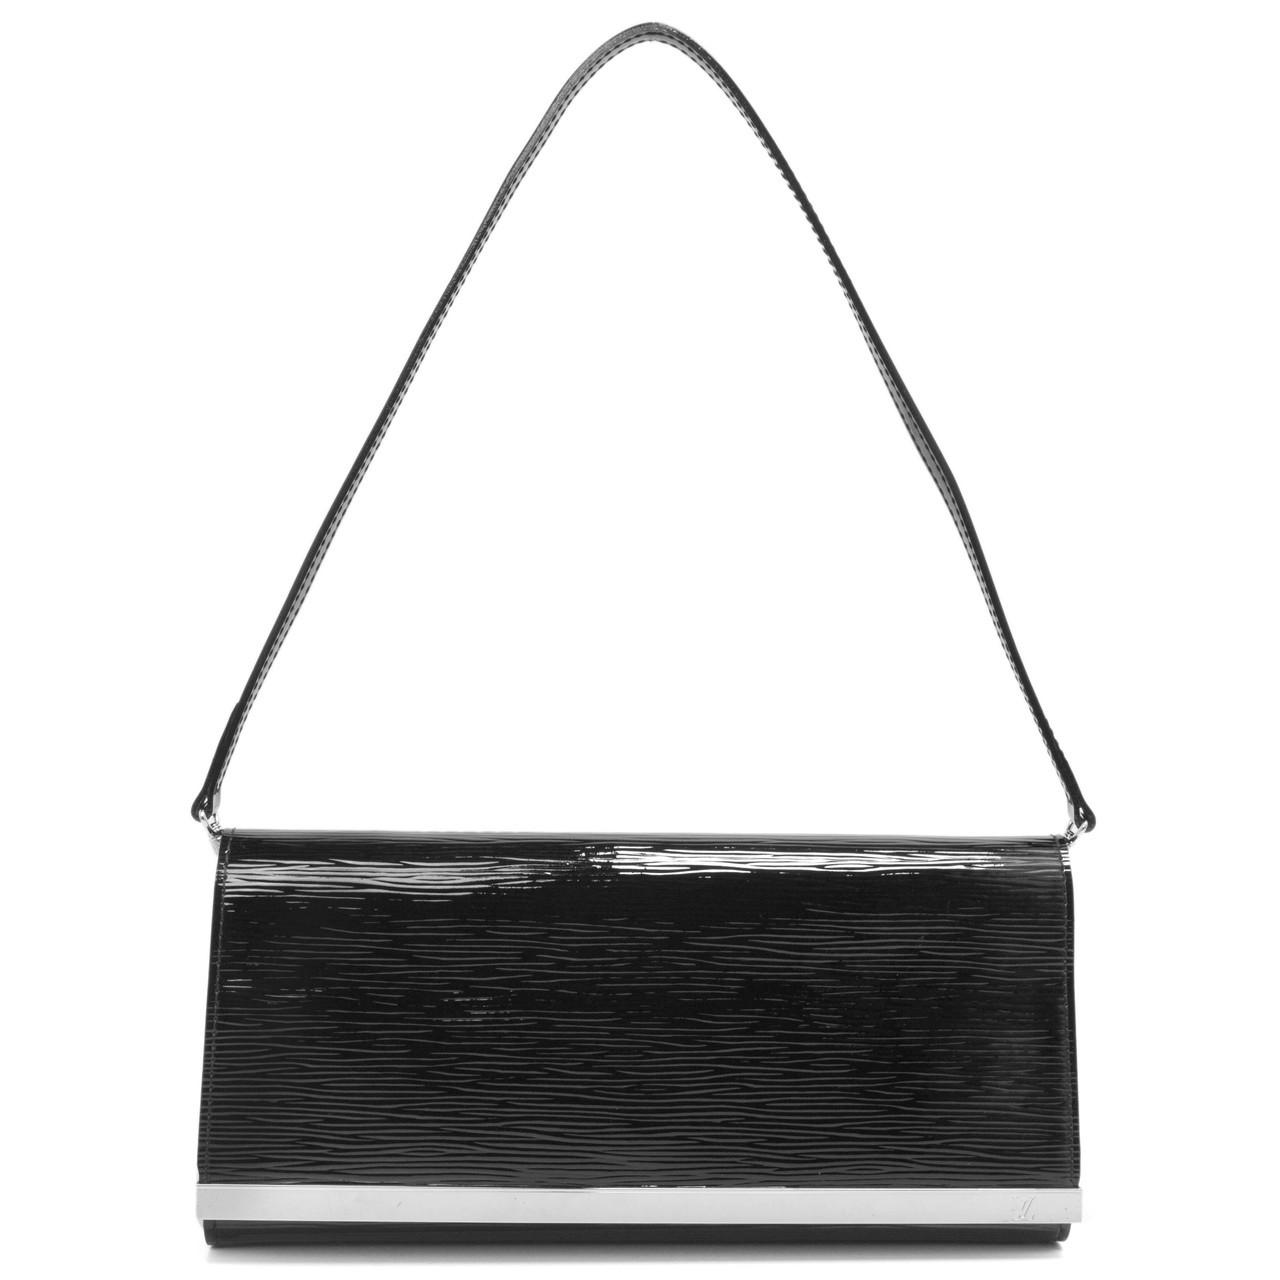 0b4cb4ba0a53e Louis Vuitton Black Electric Epi Sevigne Clutch - modaselle